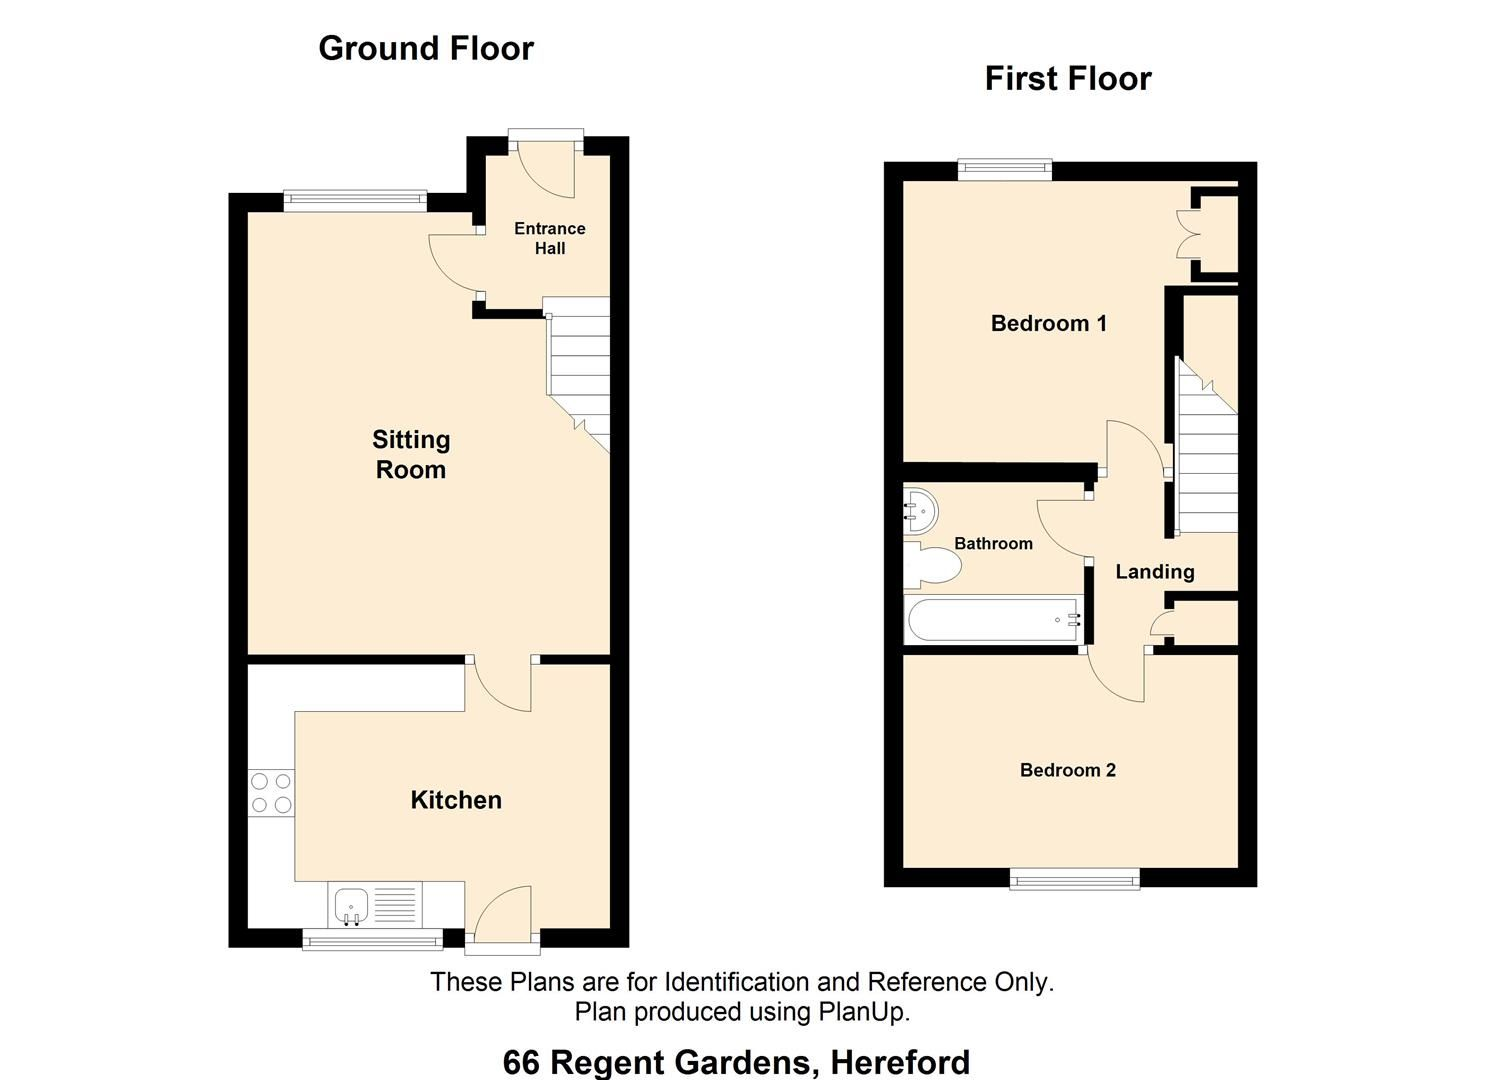 2 bed terraced to rent - Property Floorplan